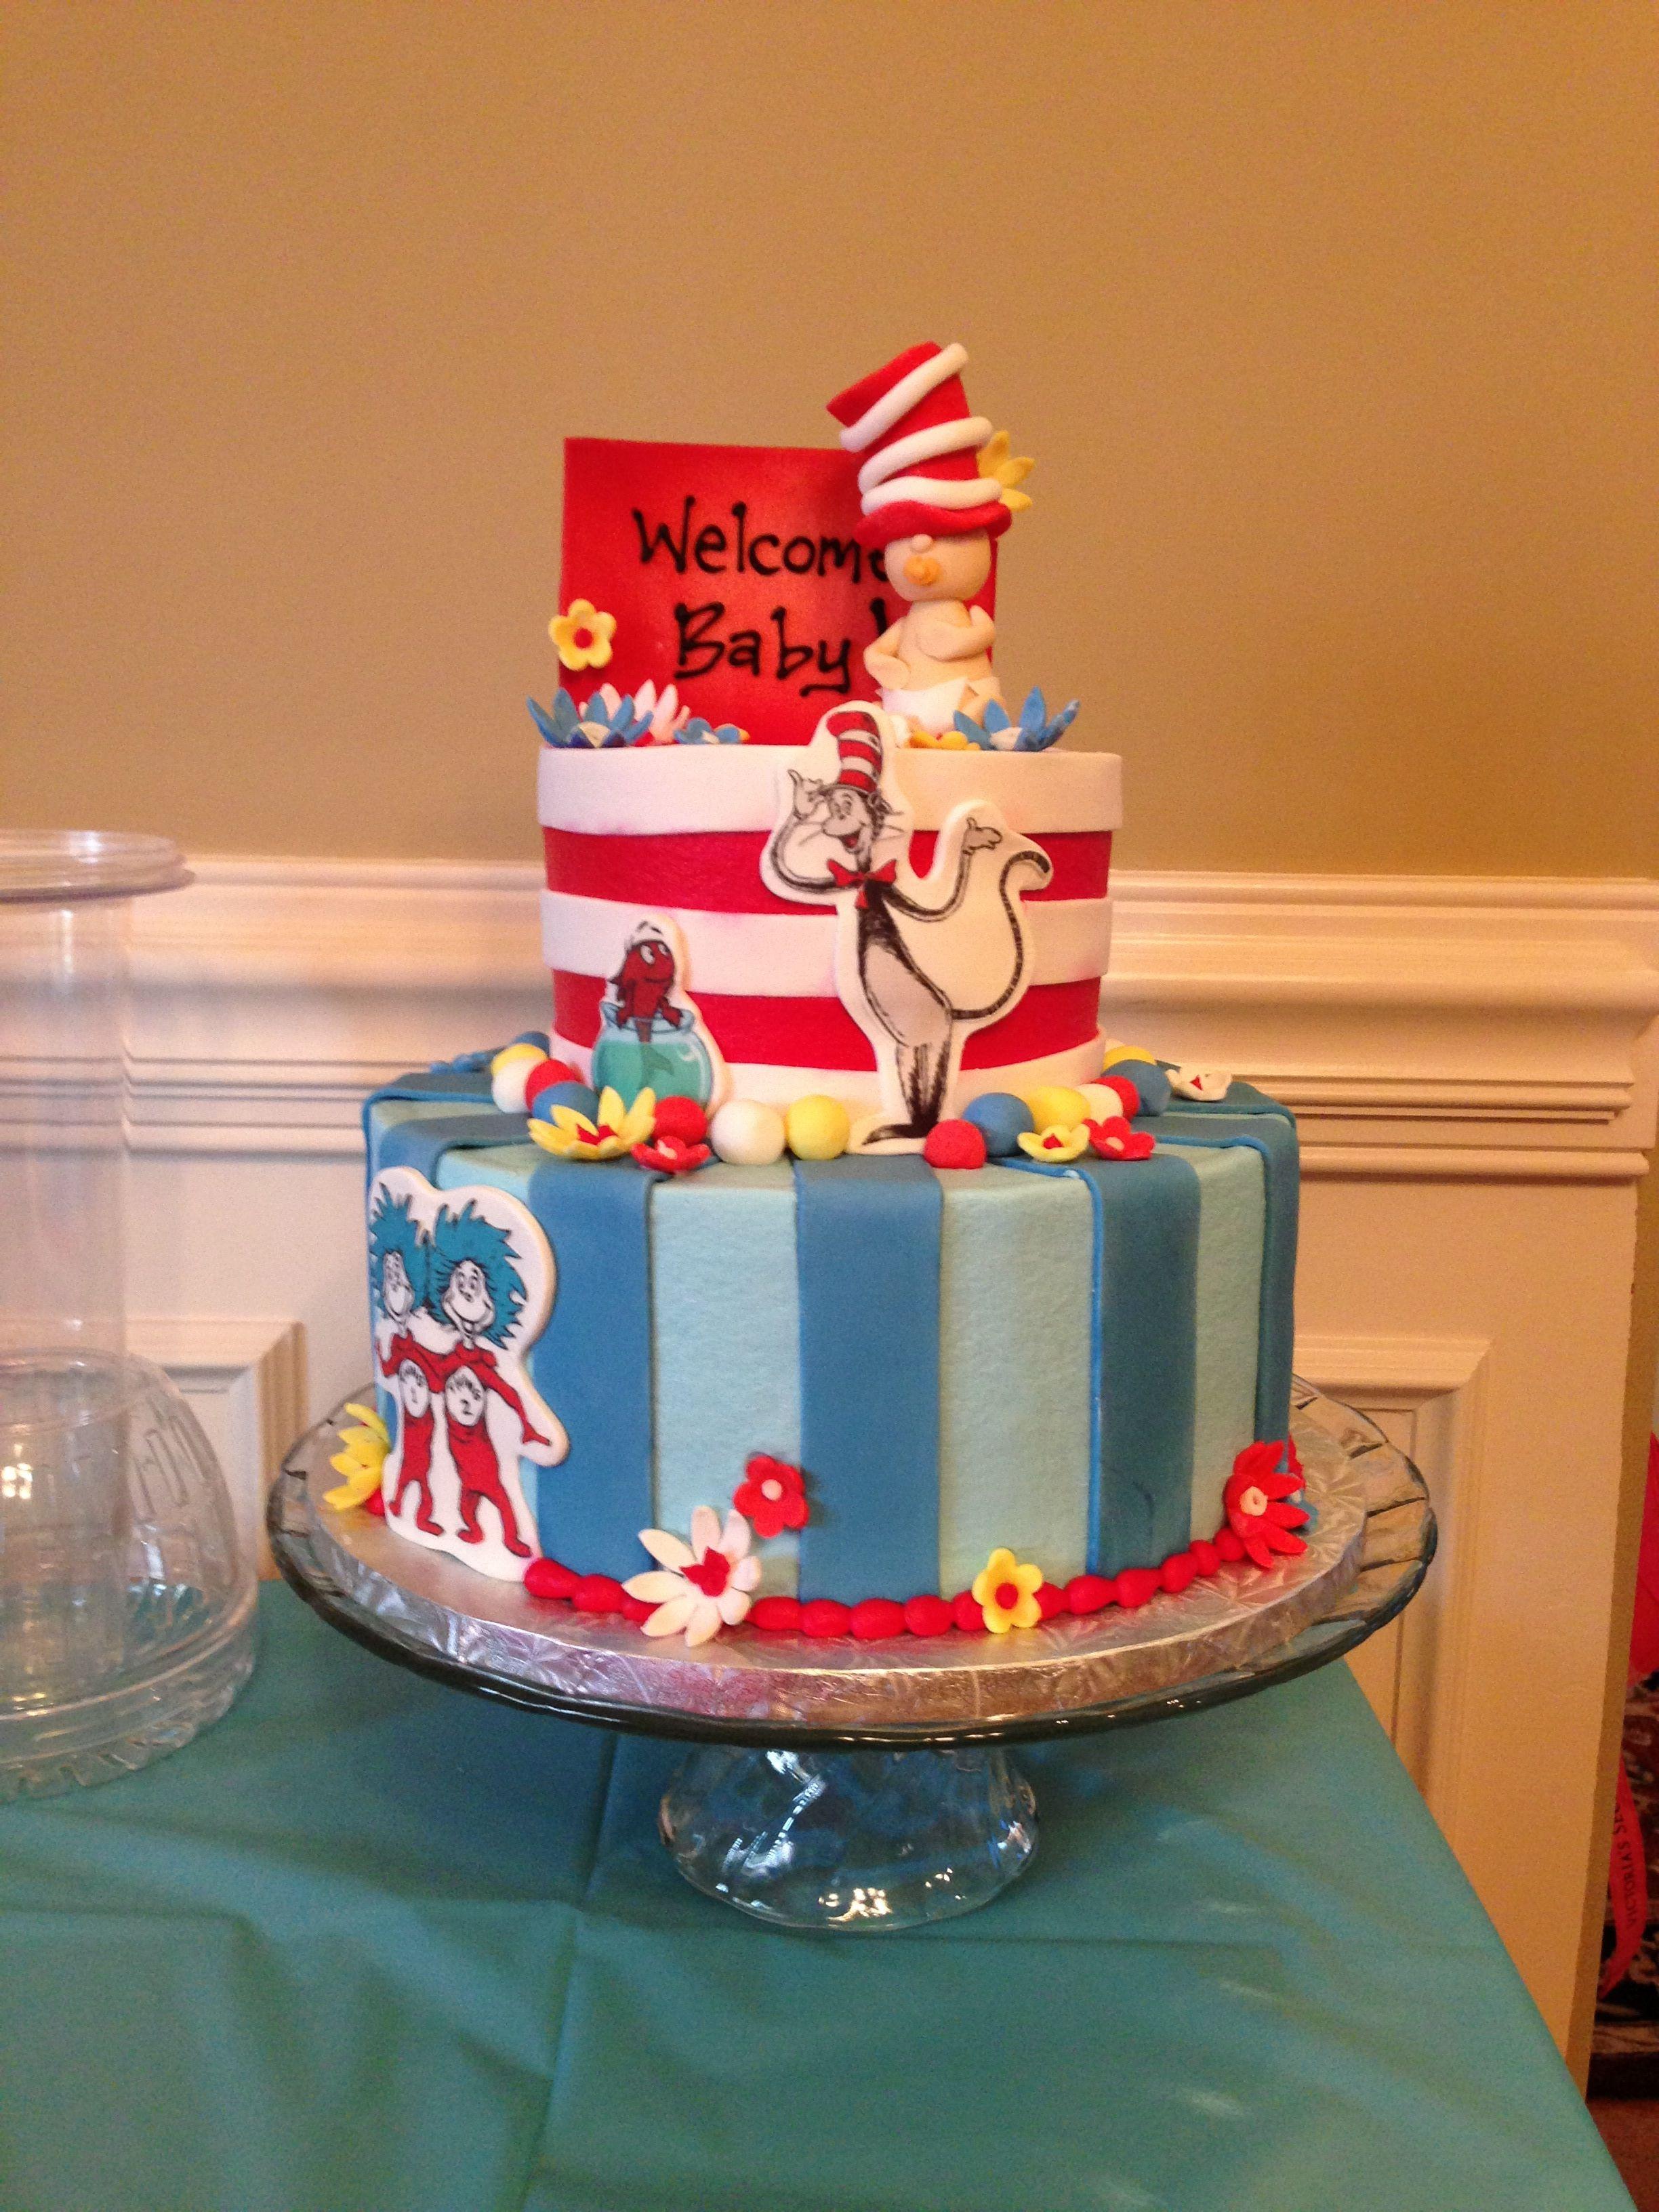 Dr Seuss Baby Shower Cake Seuss Baby Shower Cake Seuss Baby